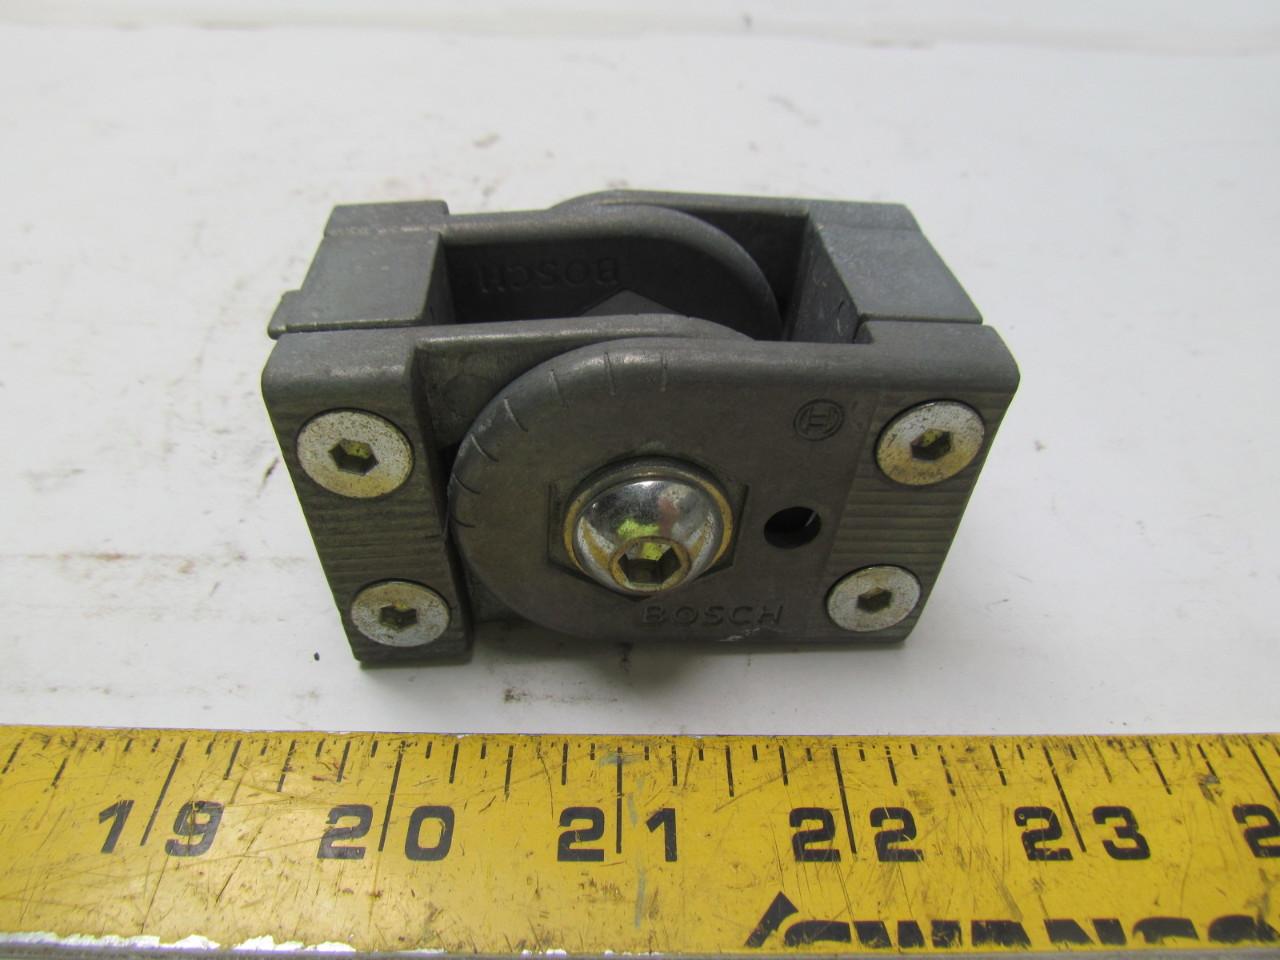 Bosch Rexroth 3 842 502 680 aluminum framing multi-angle connectors lot of 3   eBay